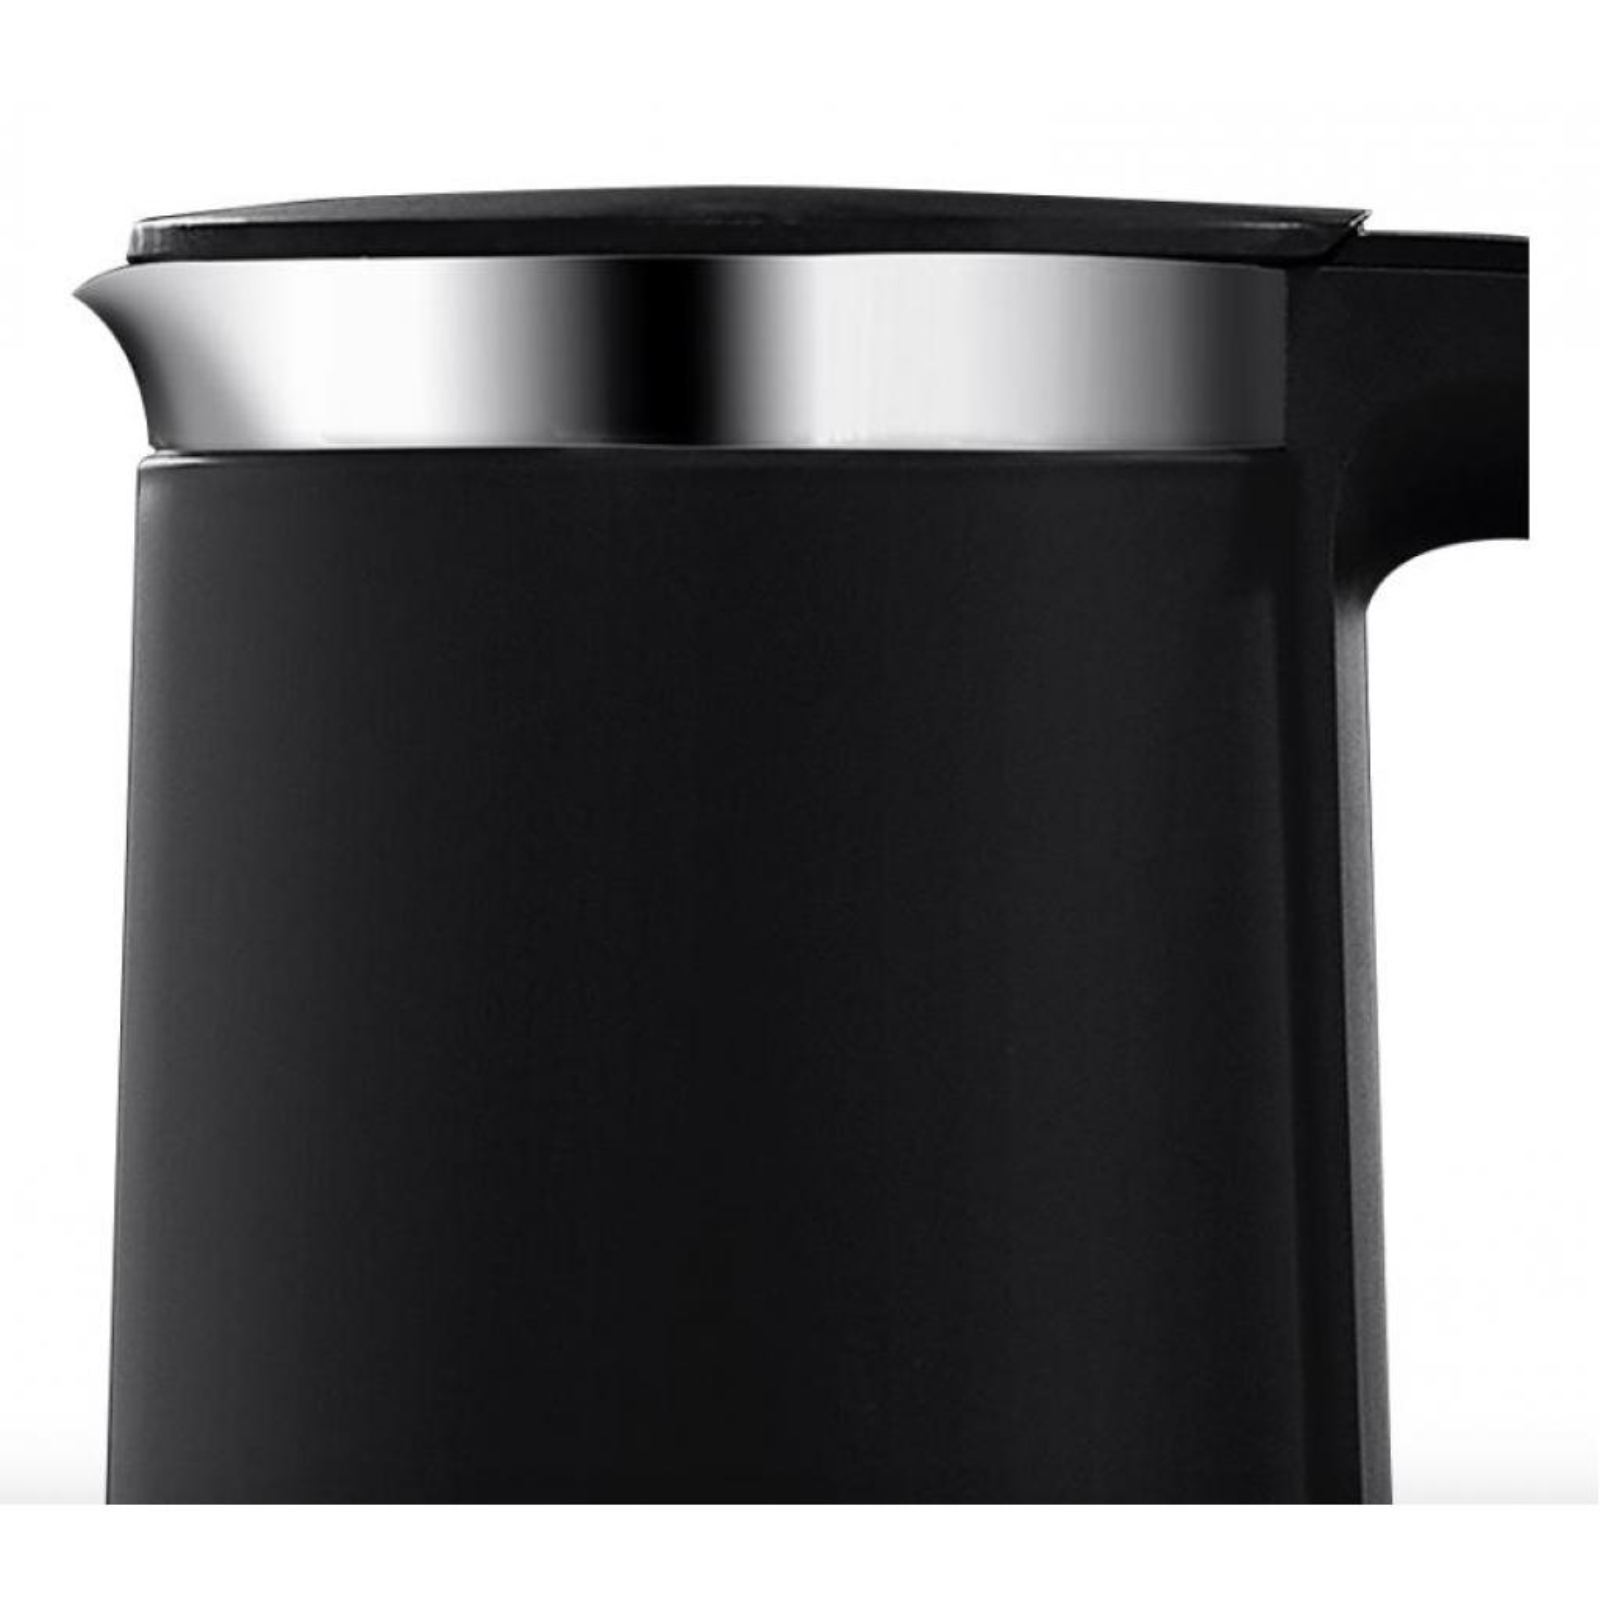 Електрочайник Xiaomi Viomi Smart Kettle Black (V-SK152B) зображення 3